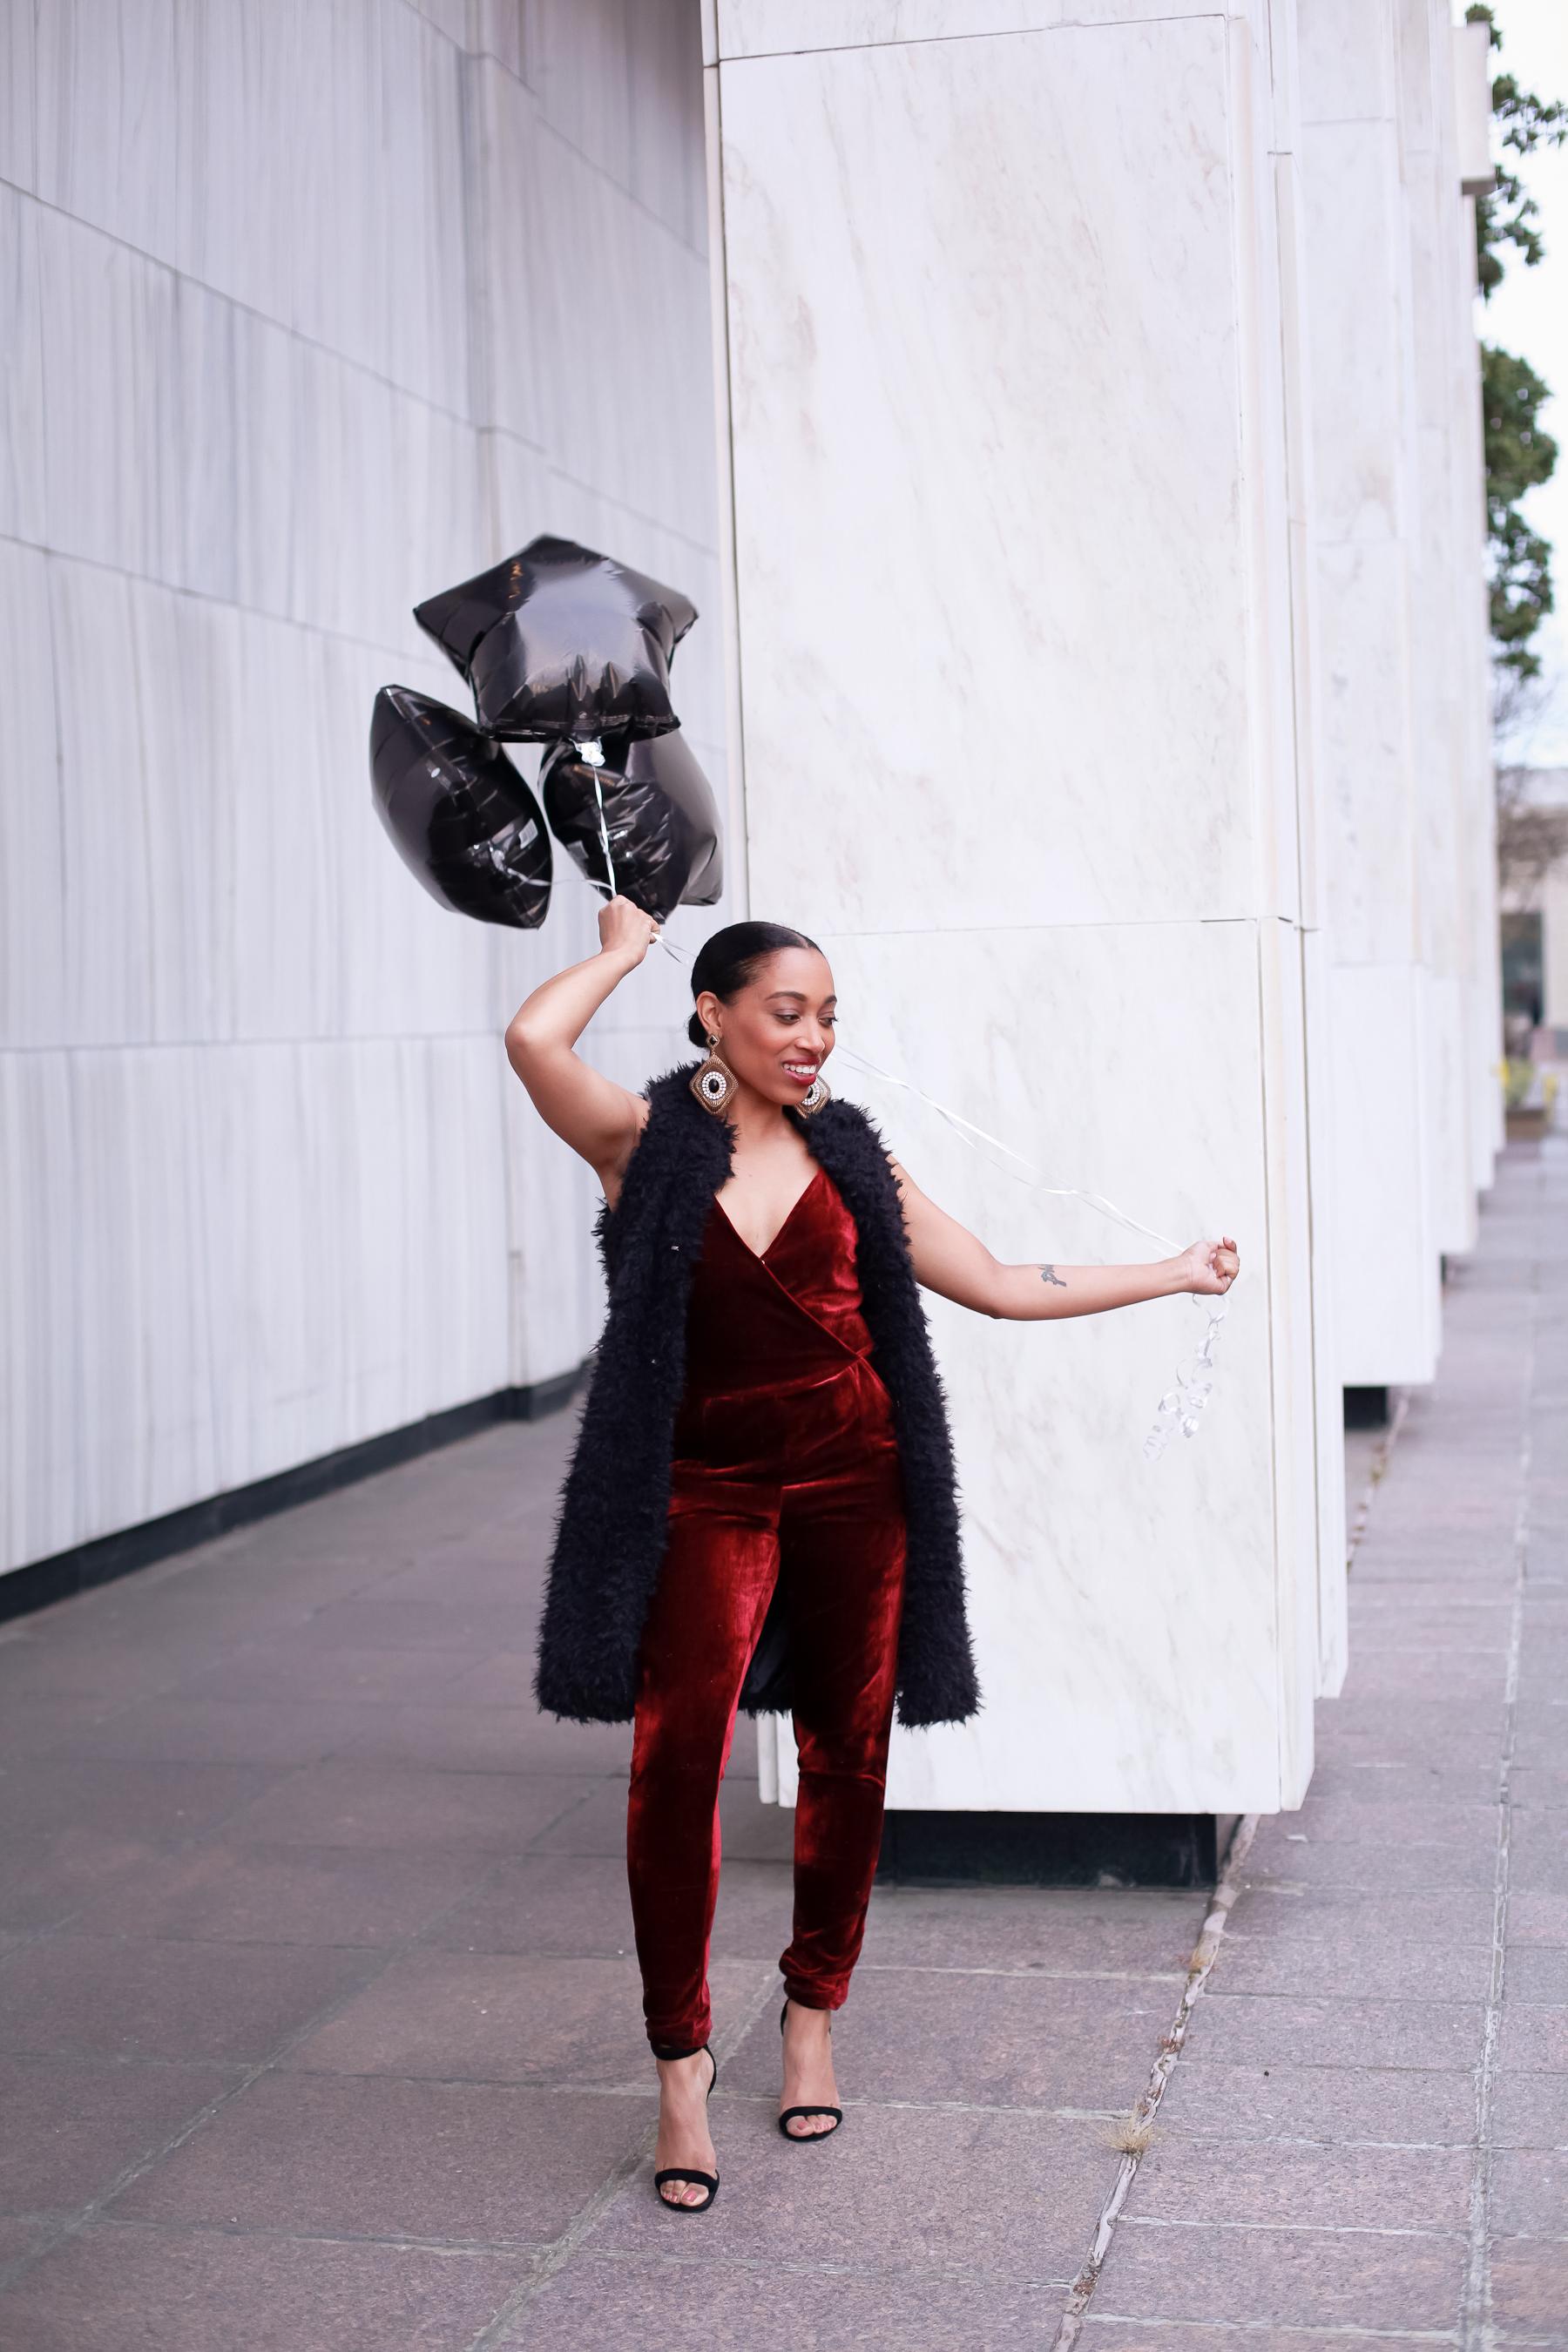 Andrea Fenise Memphis Fashion Blogger shares best of 2017